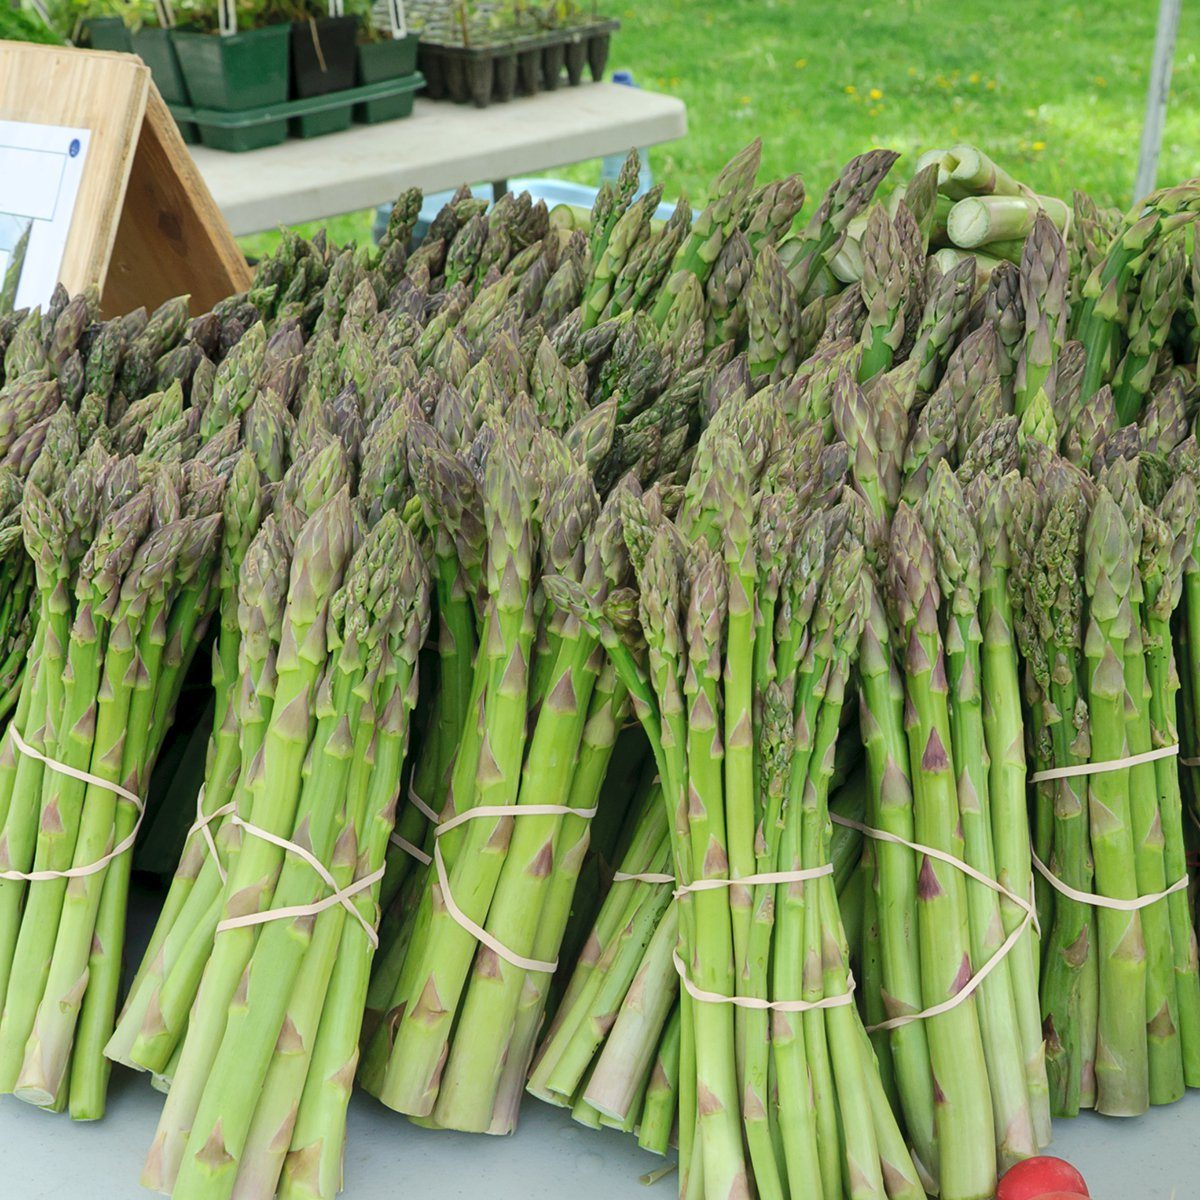 Organic asparagus for sale at farmers market; Shutterstock ID 78094342; Job (TFH, TOH, RD, BNB, CWM, CM): TOH